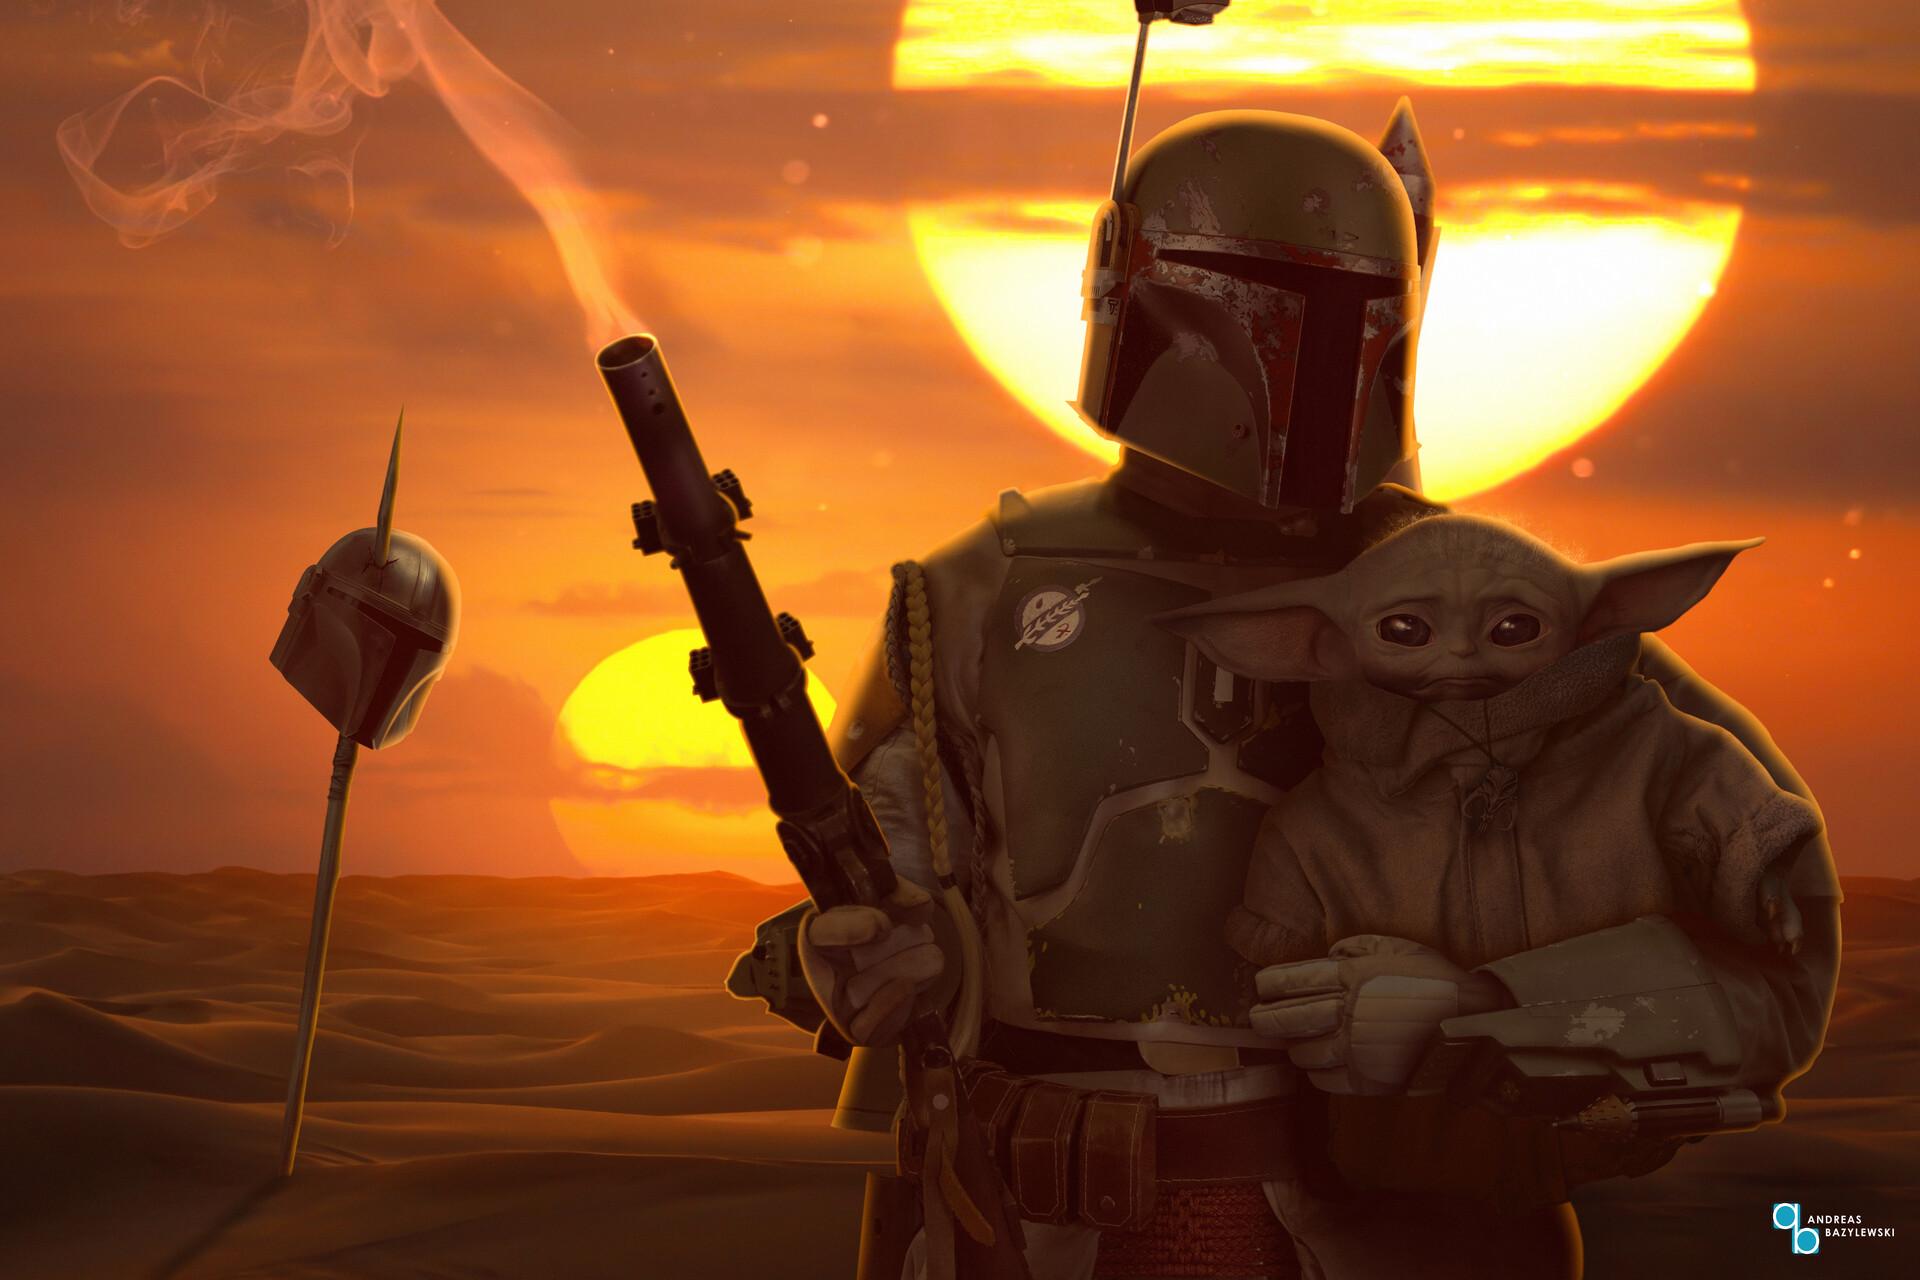 ArtStation - Star Wars: The Mandalorian - Boba Fett's return, Andreas Bazylewski